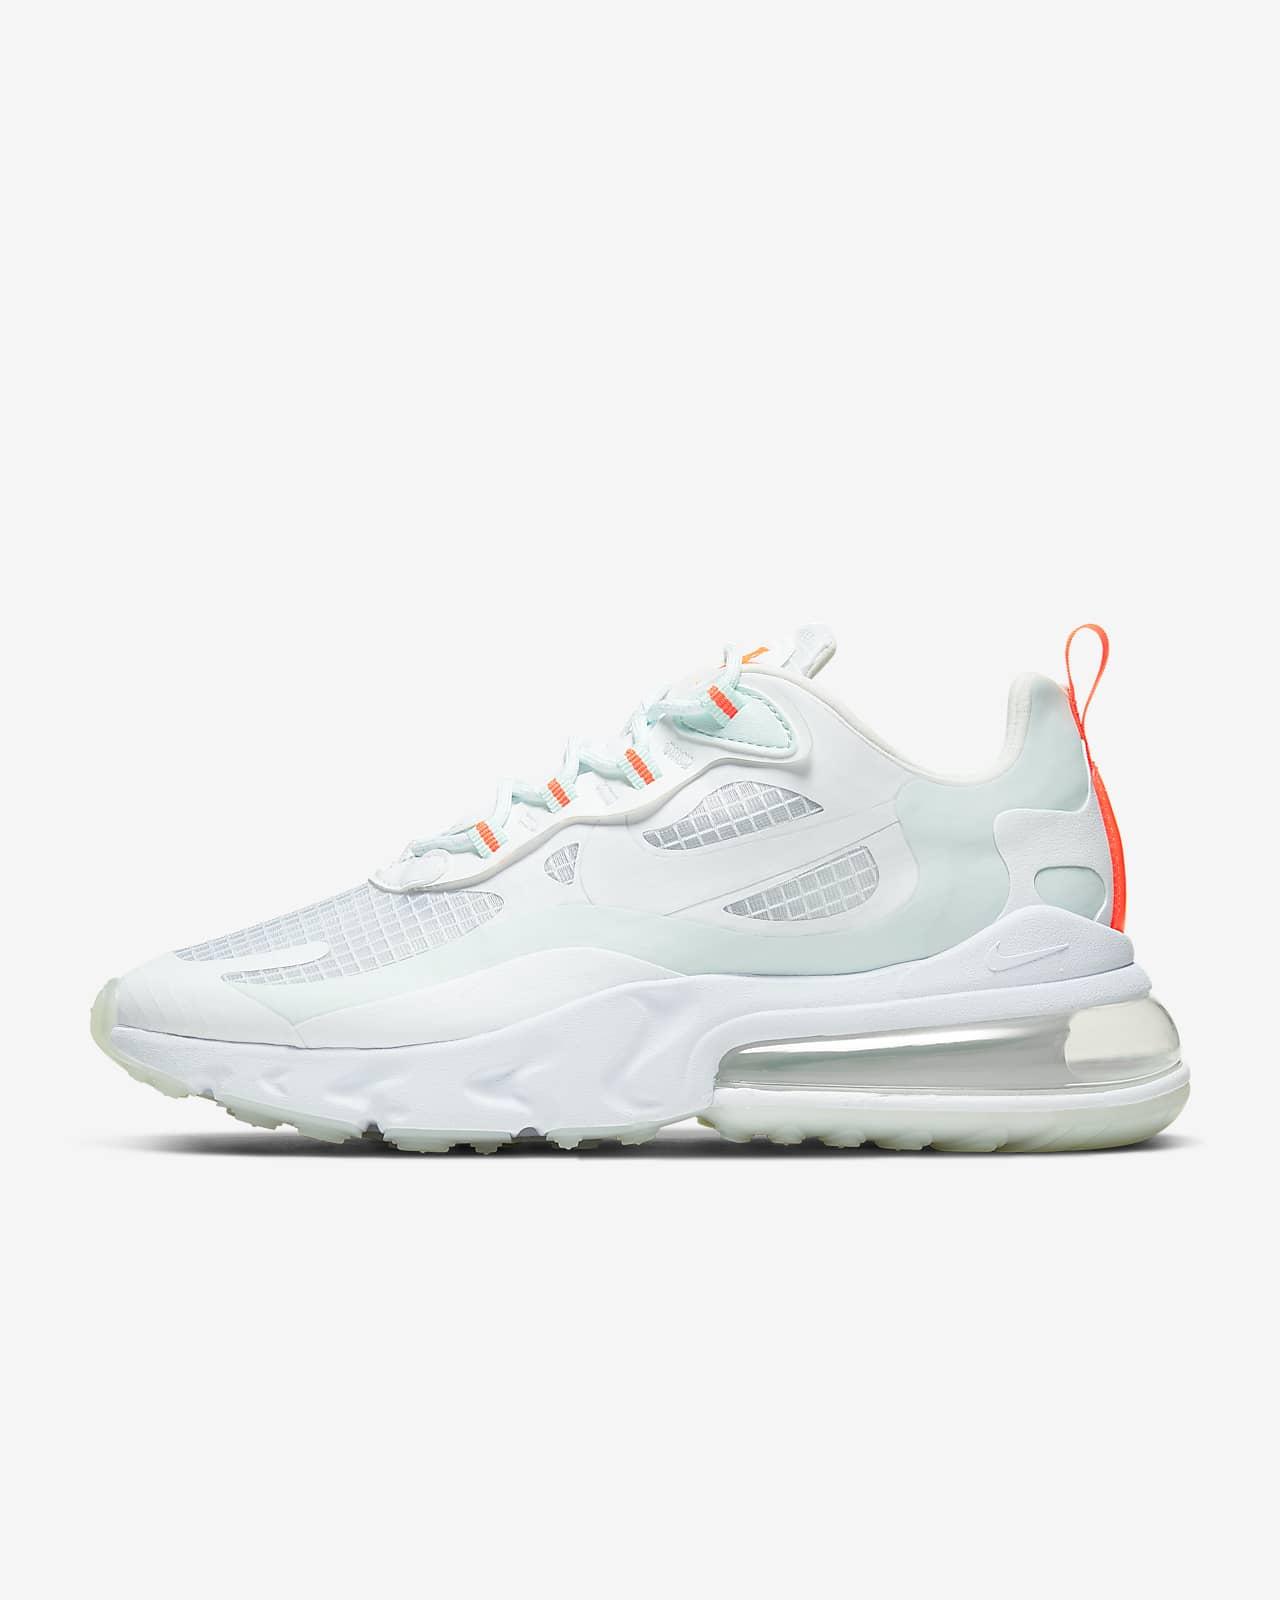 Chaussure Nike Air Max 270 React SE pour Femme